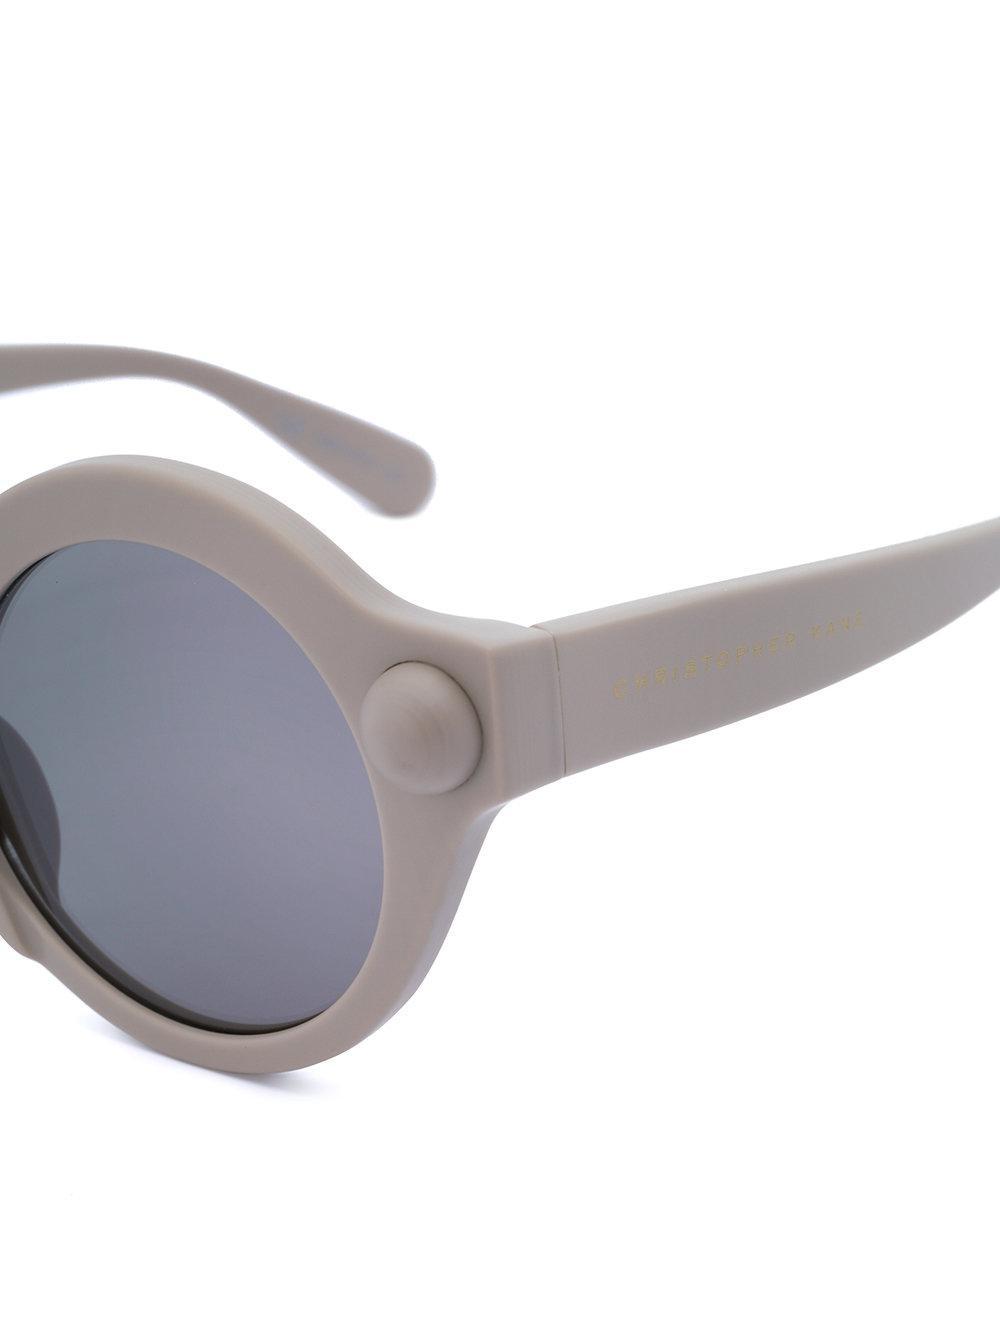 Christopher Kane Round-frame Sunglasses in Grey (Grey)